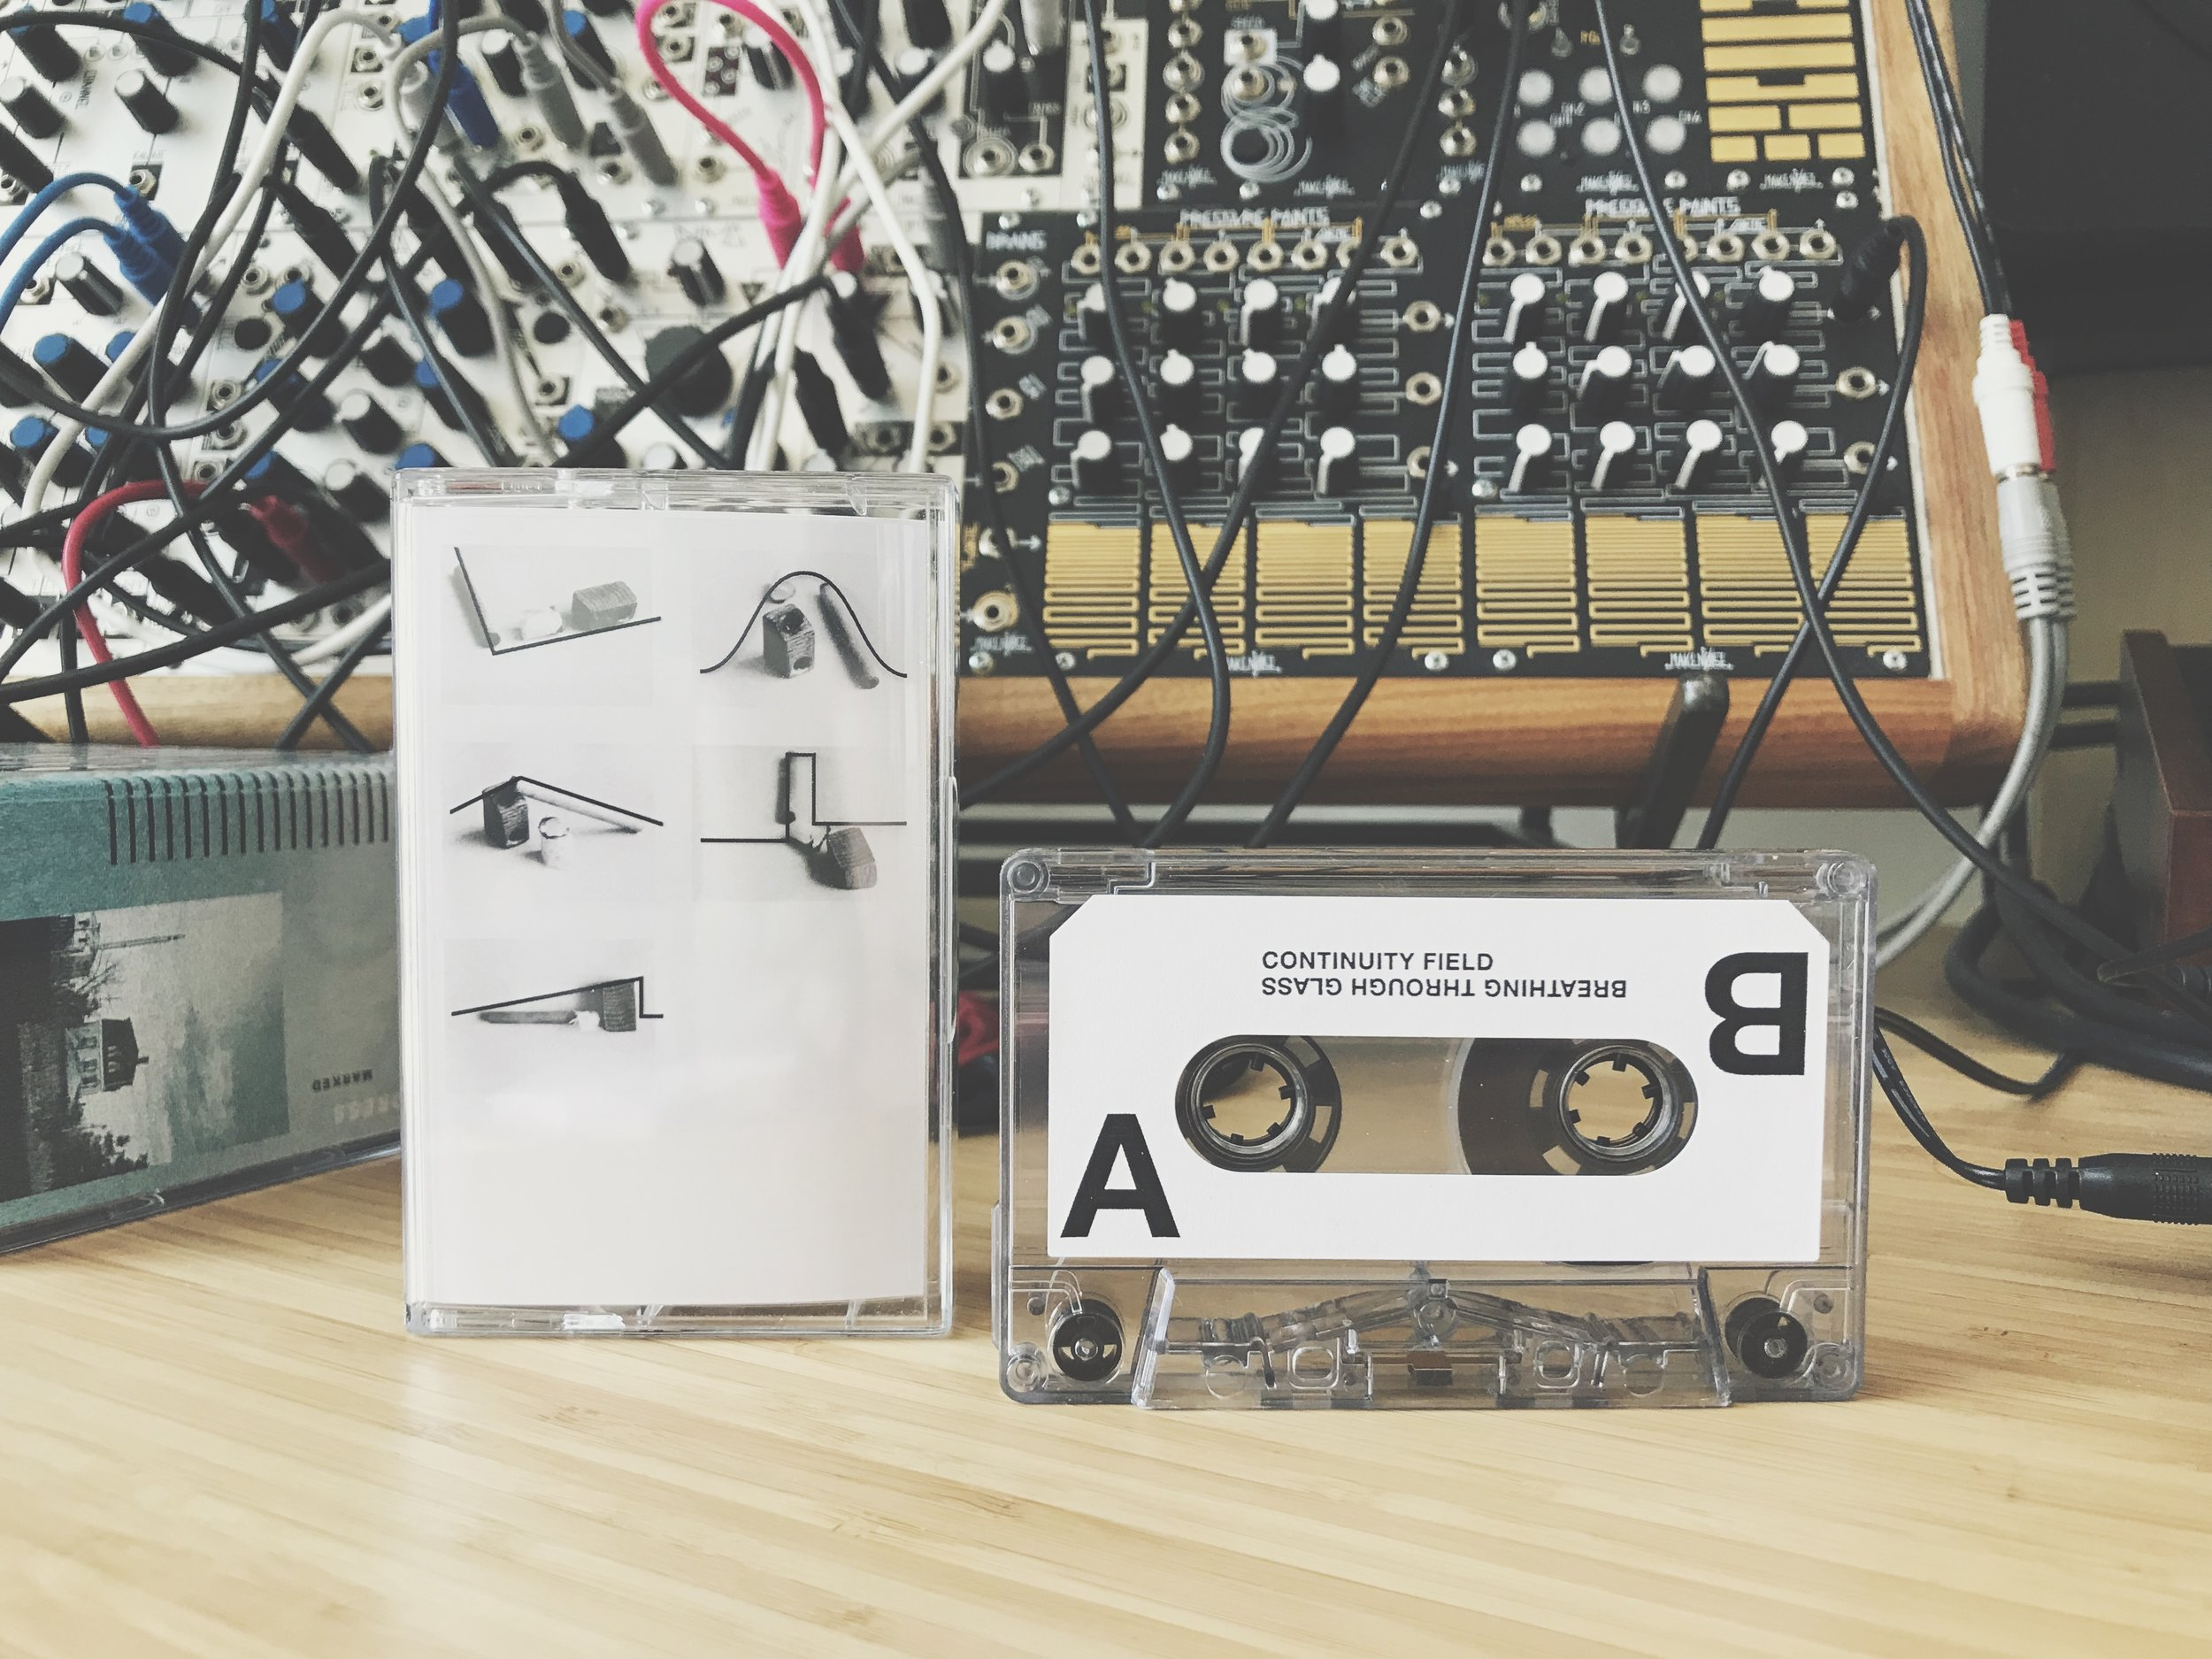 Sonatine / T Soltau - Continuity Field / Breathing Through Glass (Audio. Visuals. Atmosphere.)